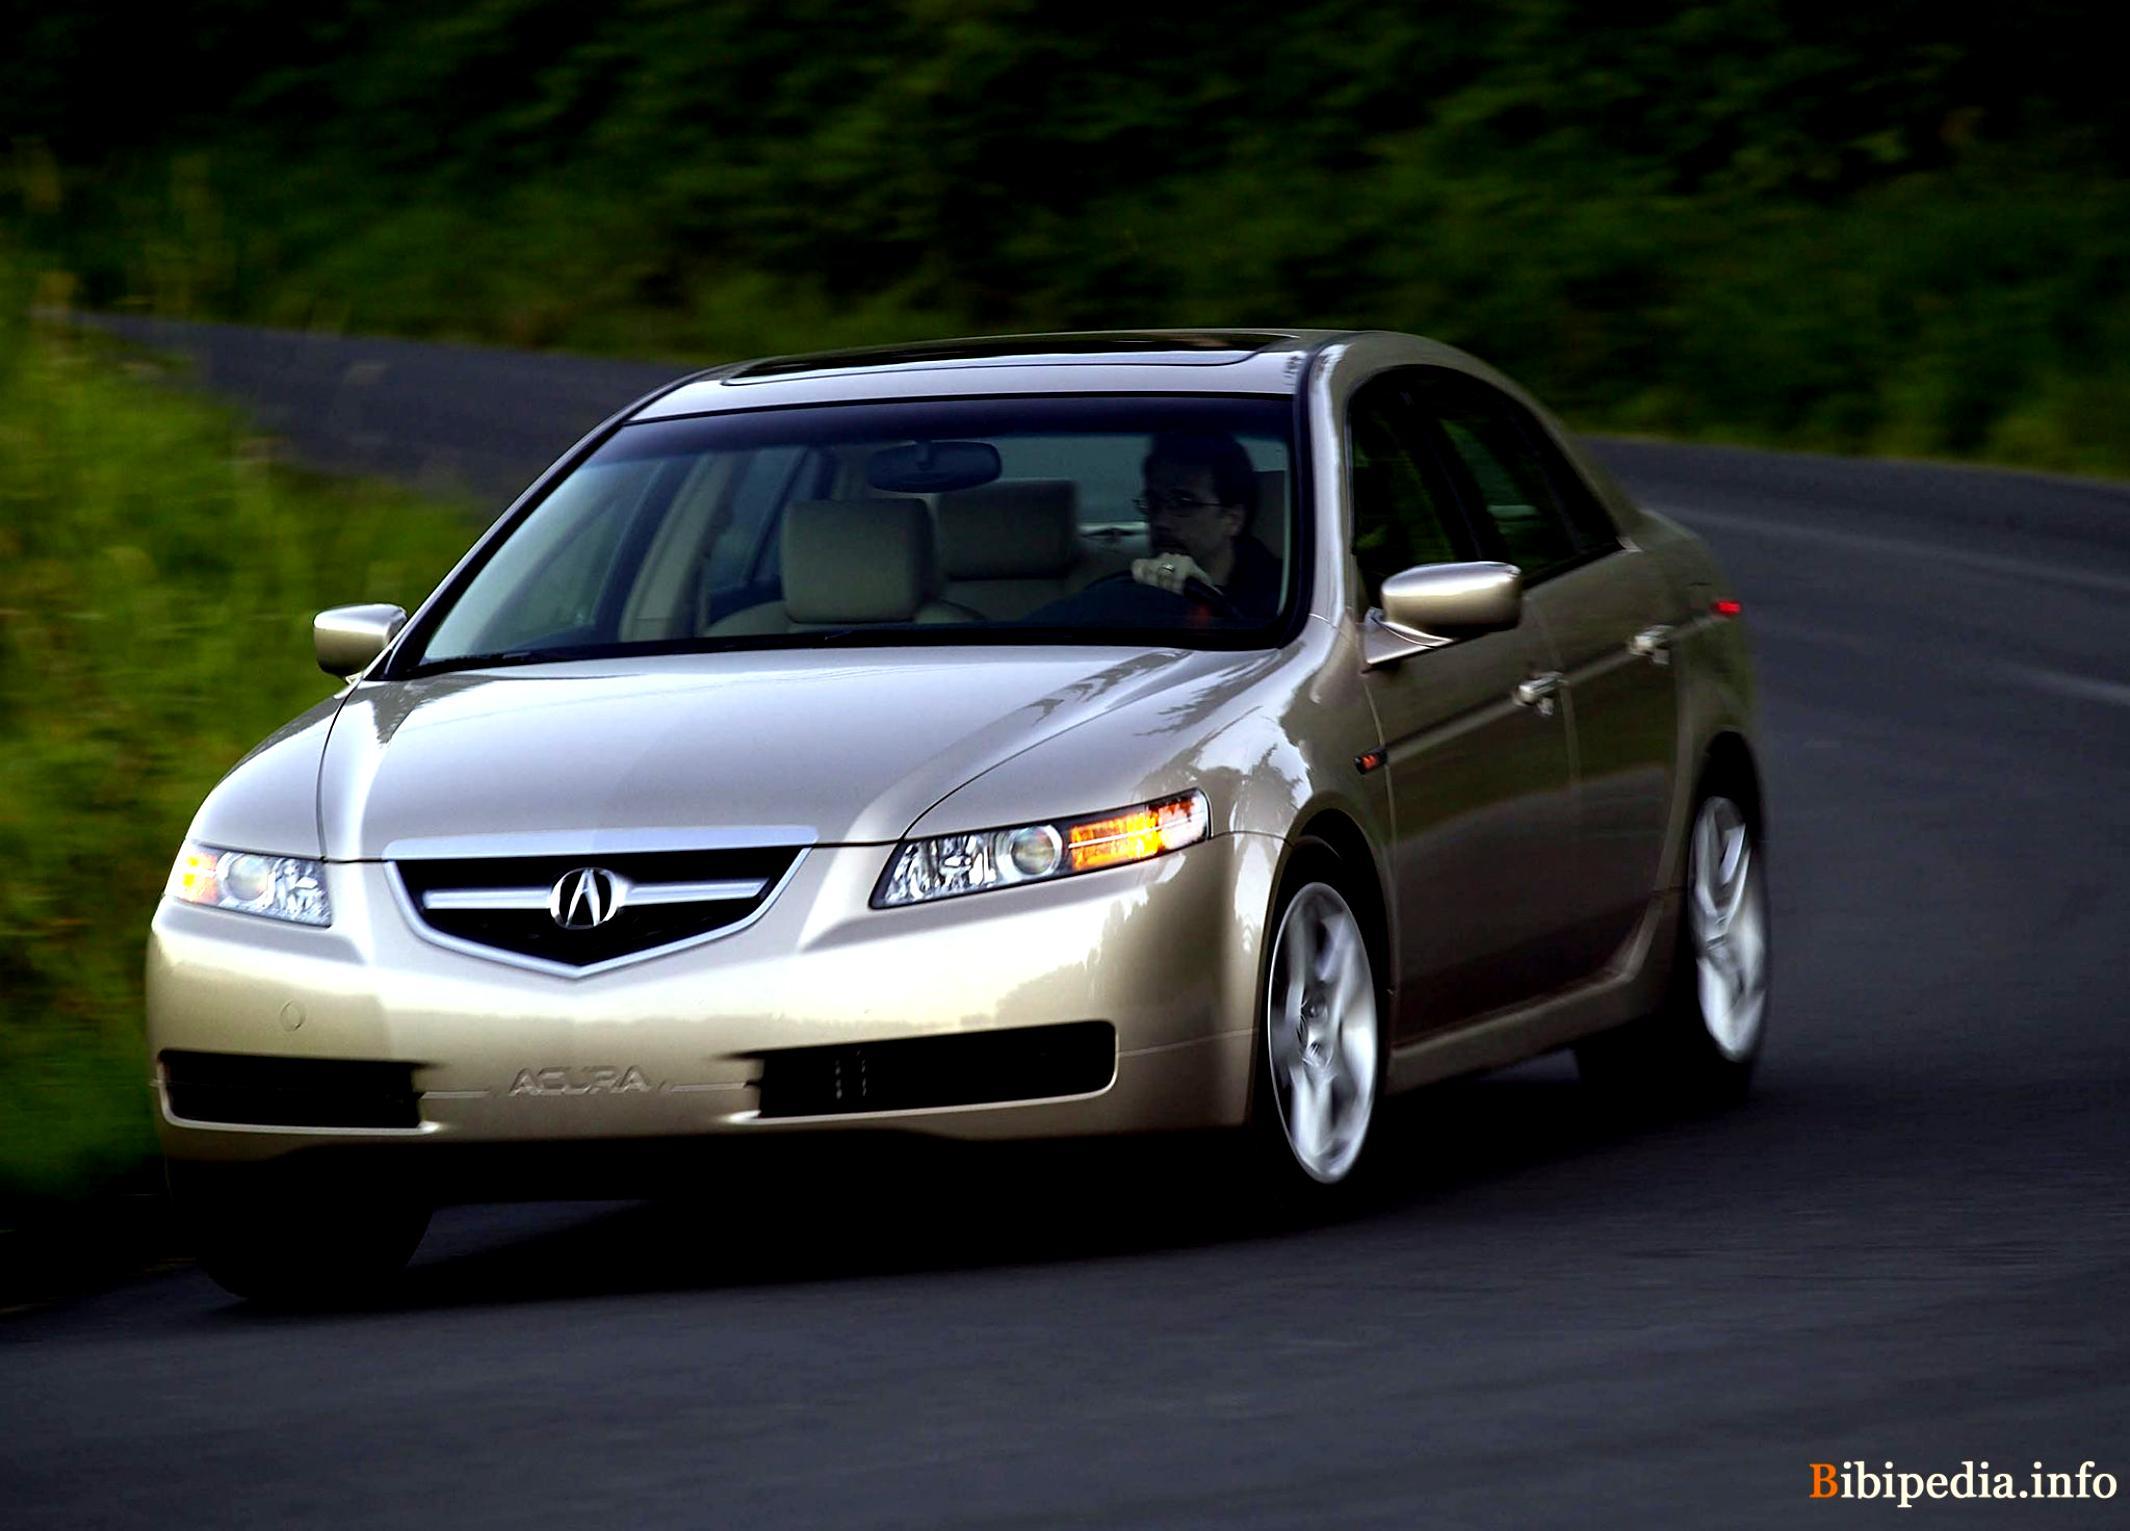 Acura TL 2003 on MotoImg.com